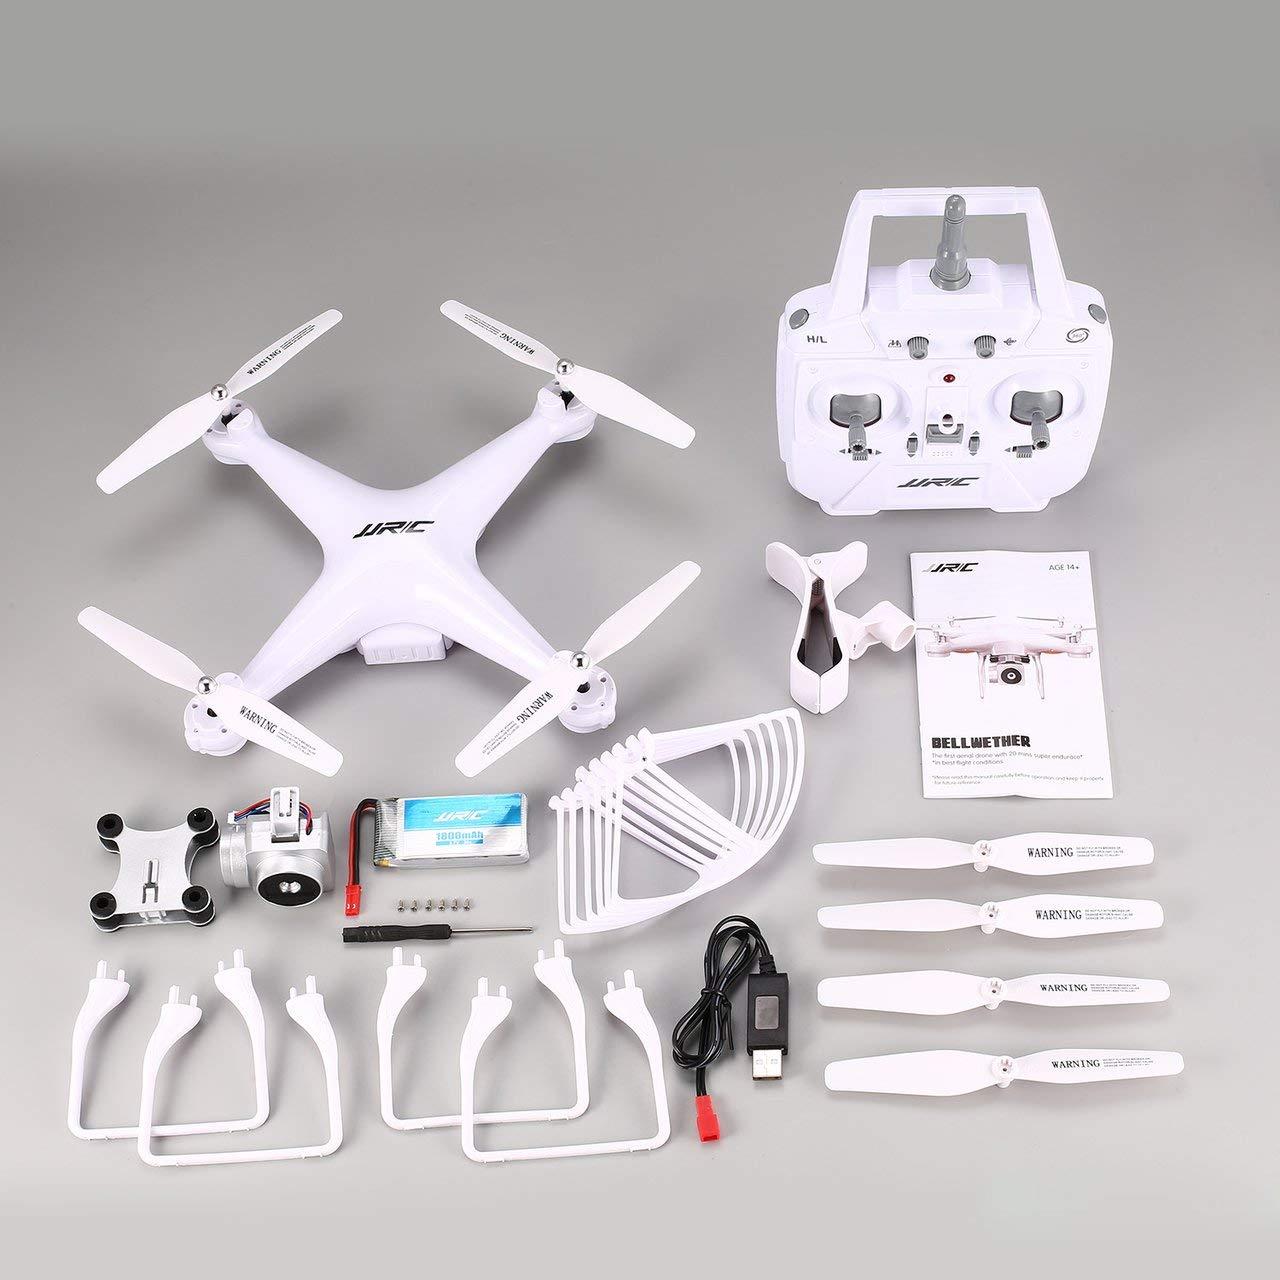 Jasnyfall JJR/C H68 720P HD-Kamera WiFi FPV RC Drone Quadcopter Altitude Hold 3D-Flip Weiß